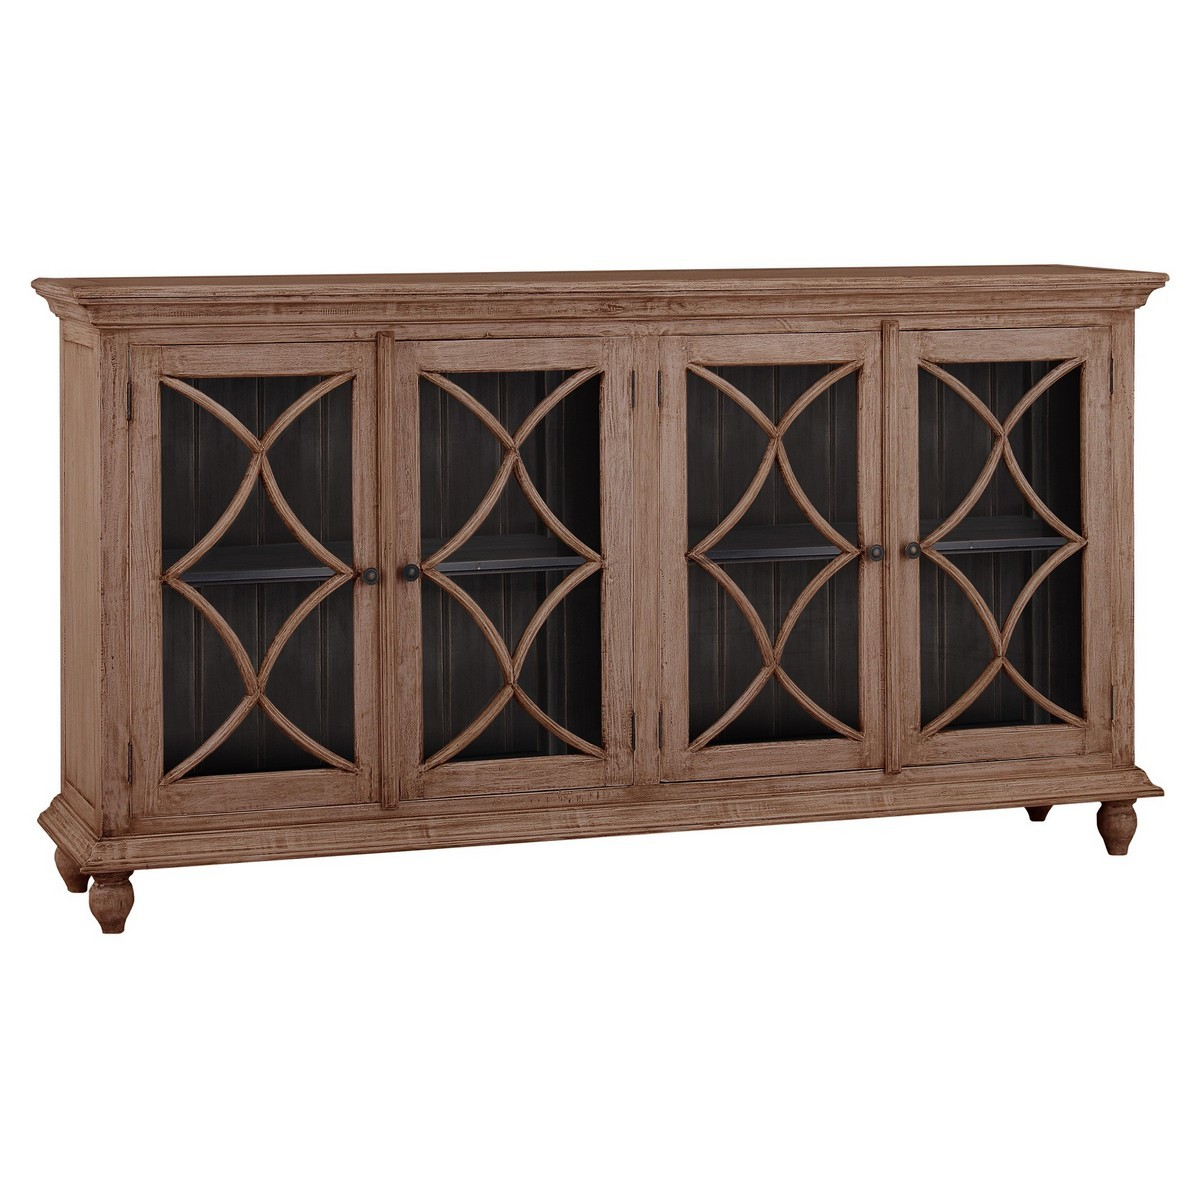 Swansea Mahogany Timber 4 Door Buffet Table, 208cm, Sorel Brown